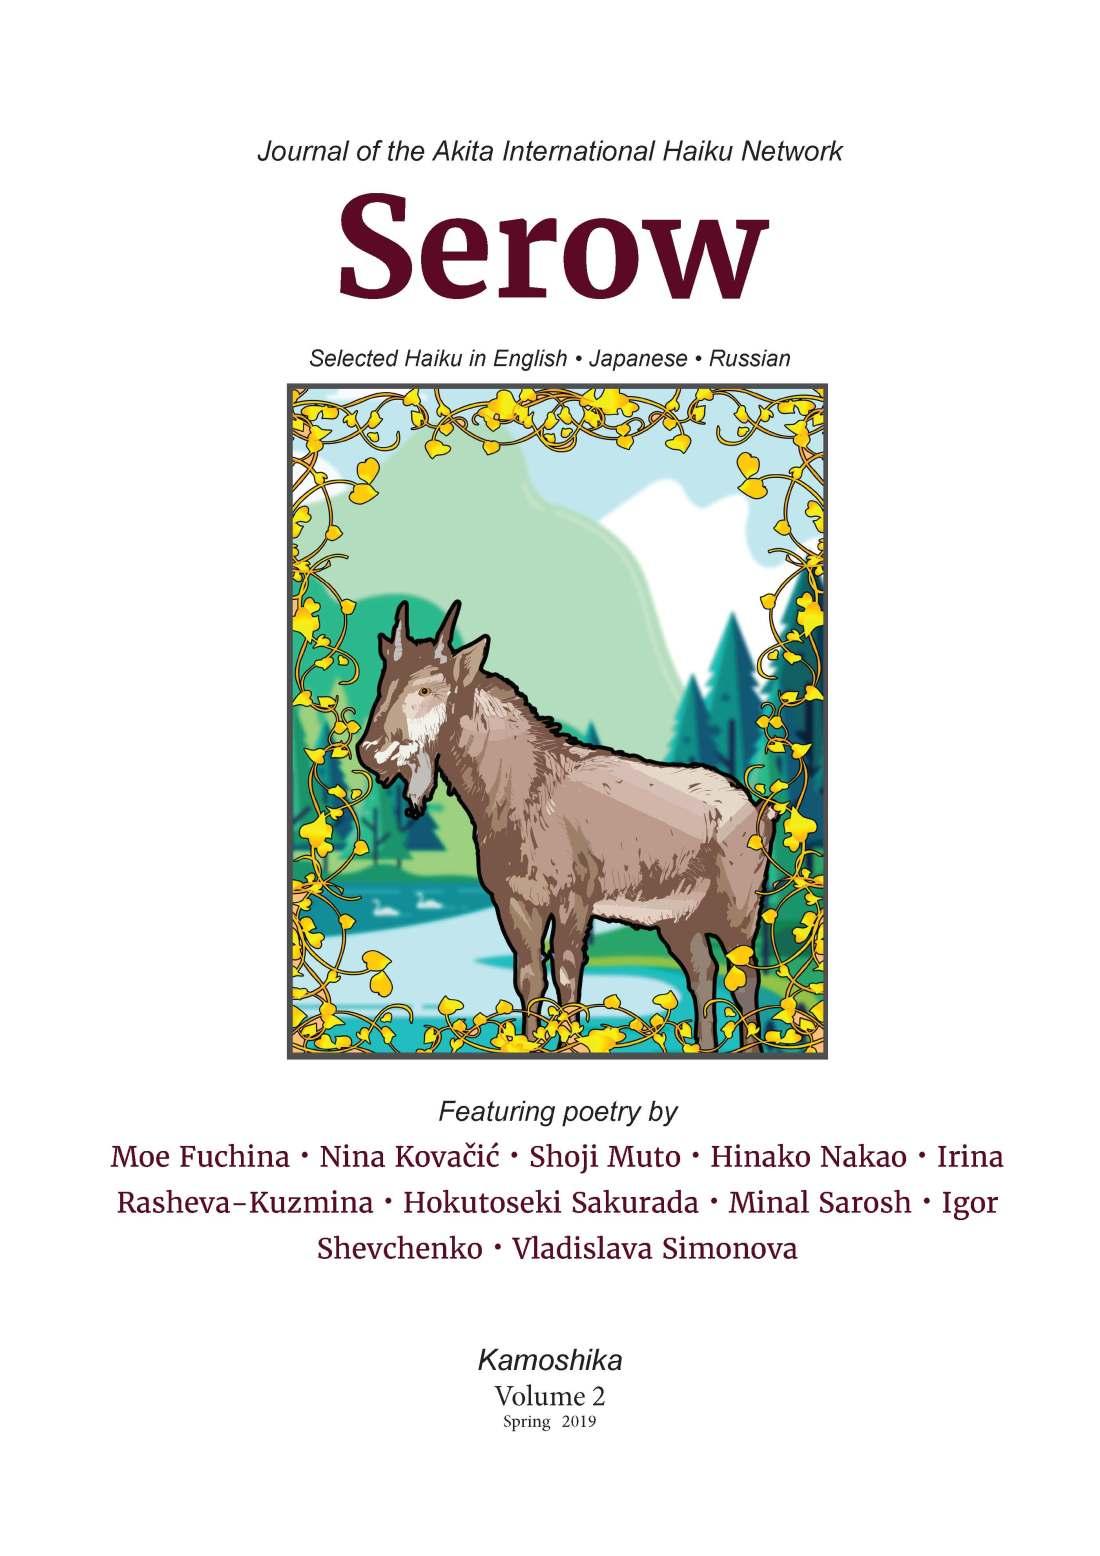 Serow Vol. 2 2019.11.04